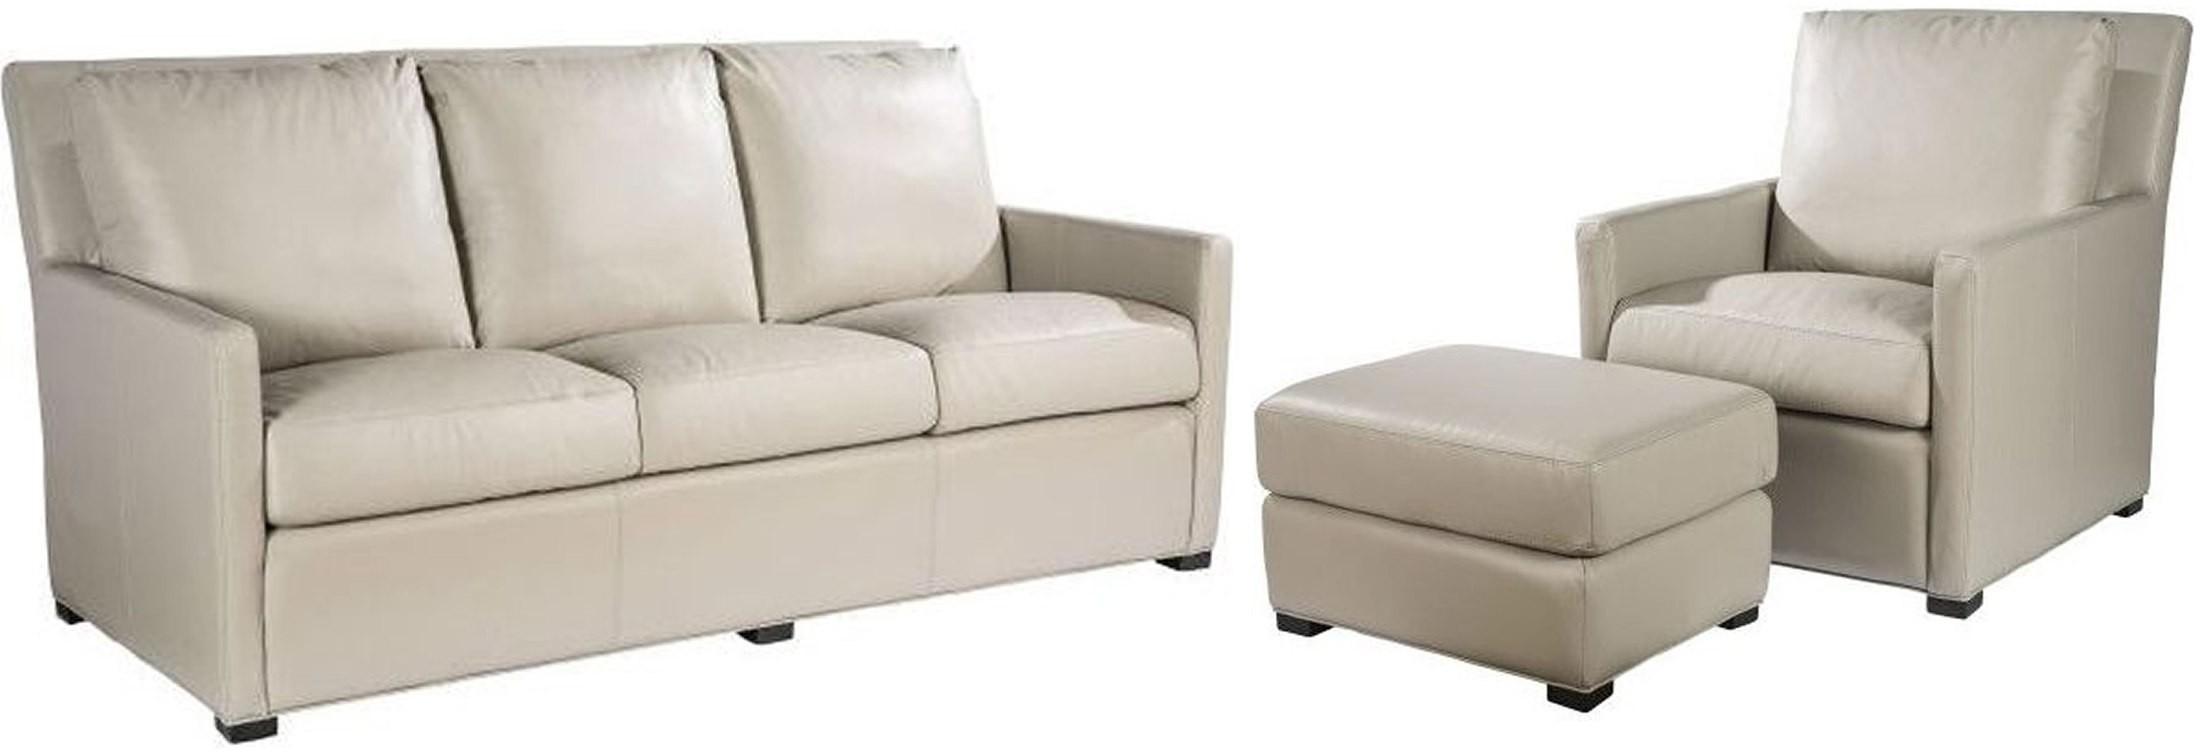 Charlotte hanson taupe living room set 151201 ht for Cheap living room sets charlotte nc